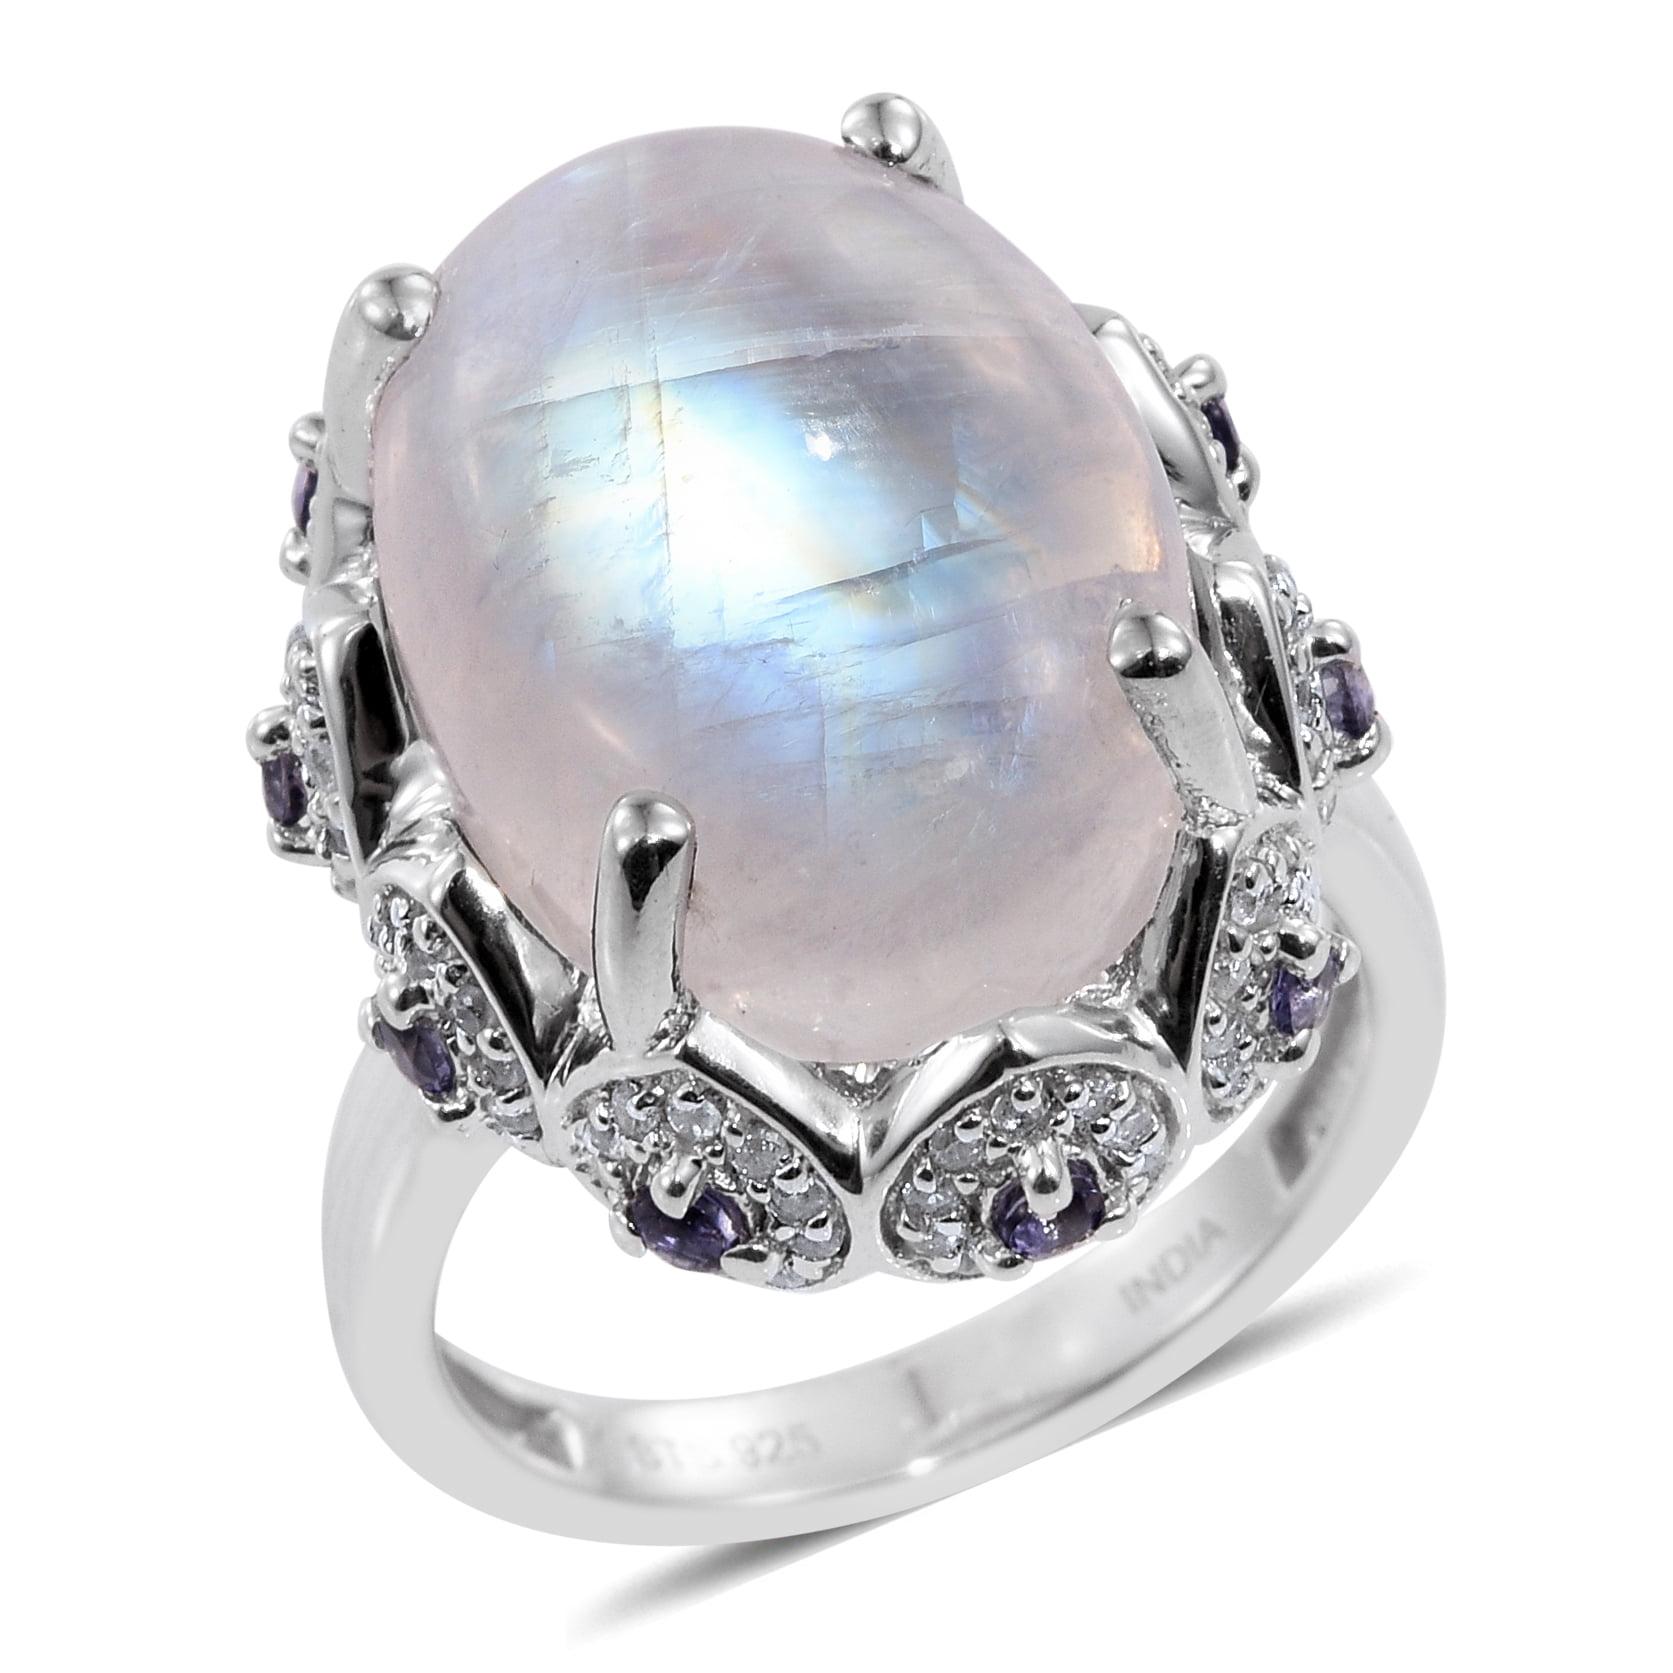 925 Sterling Silver Rectangle Cut Rainbow Moonstone Women Wedding Ring Jewelry